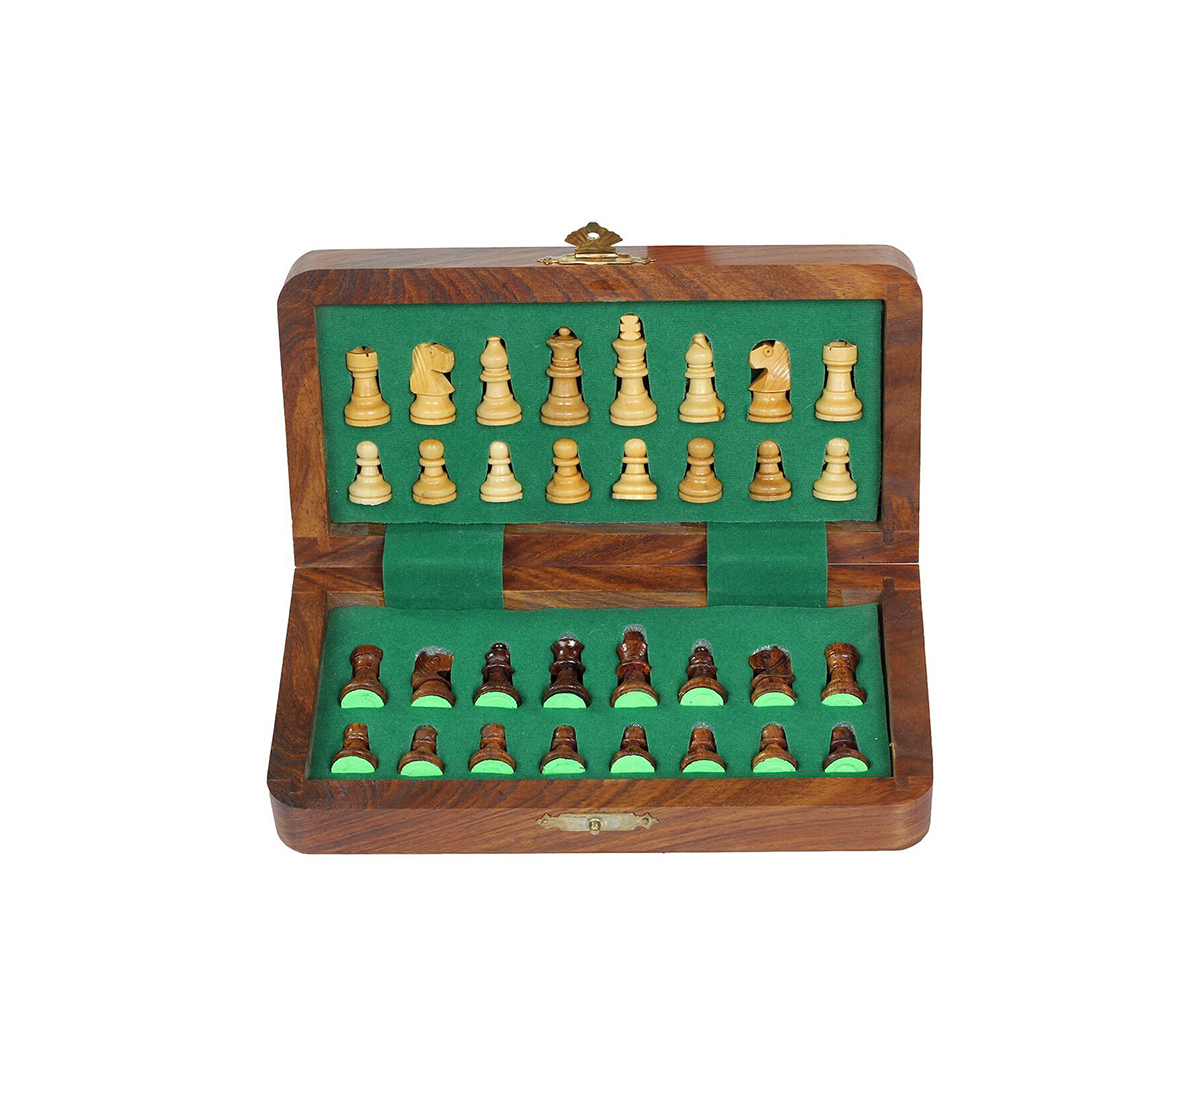 "Desi Toys | Desi Toys Magnetic Folding Chess Set 7"", Chumbak Shatranj Board Game for Kids age 5Y+ (Brown)"